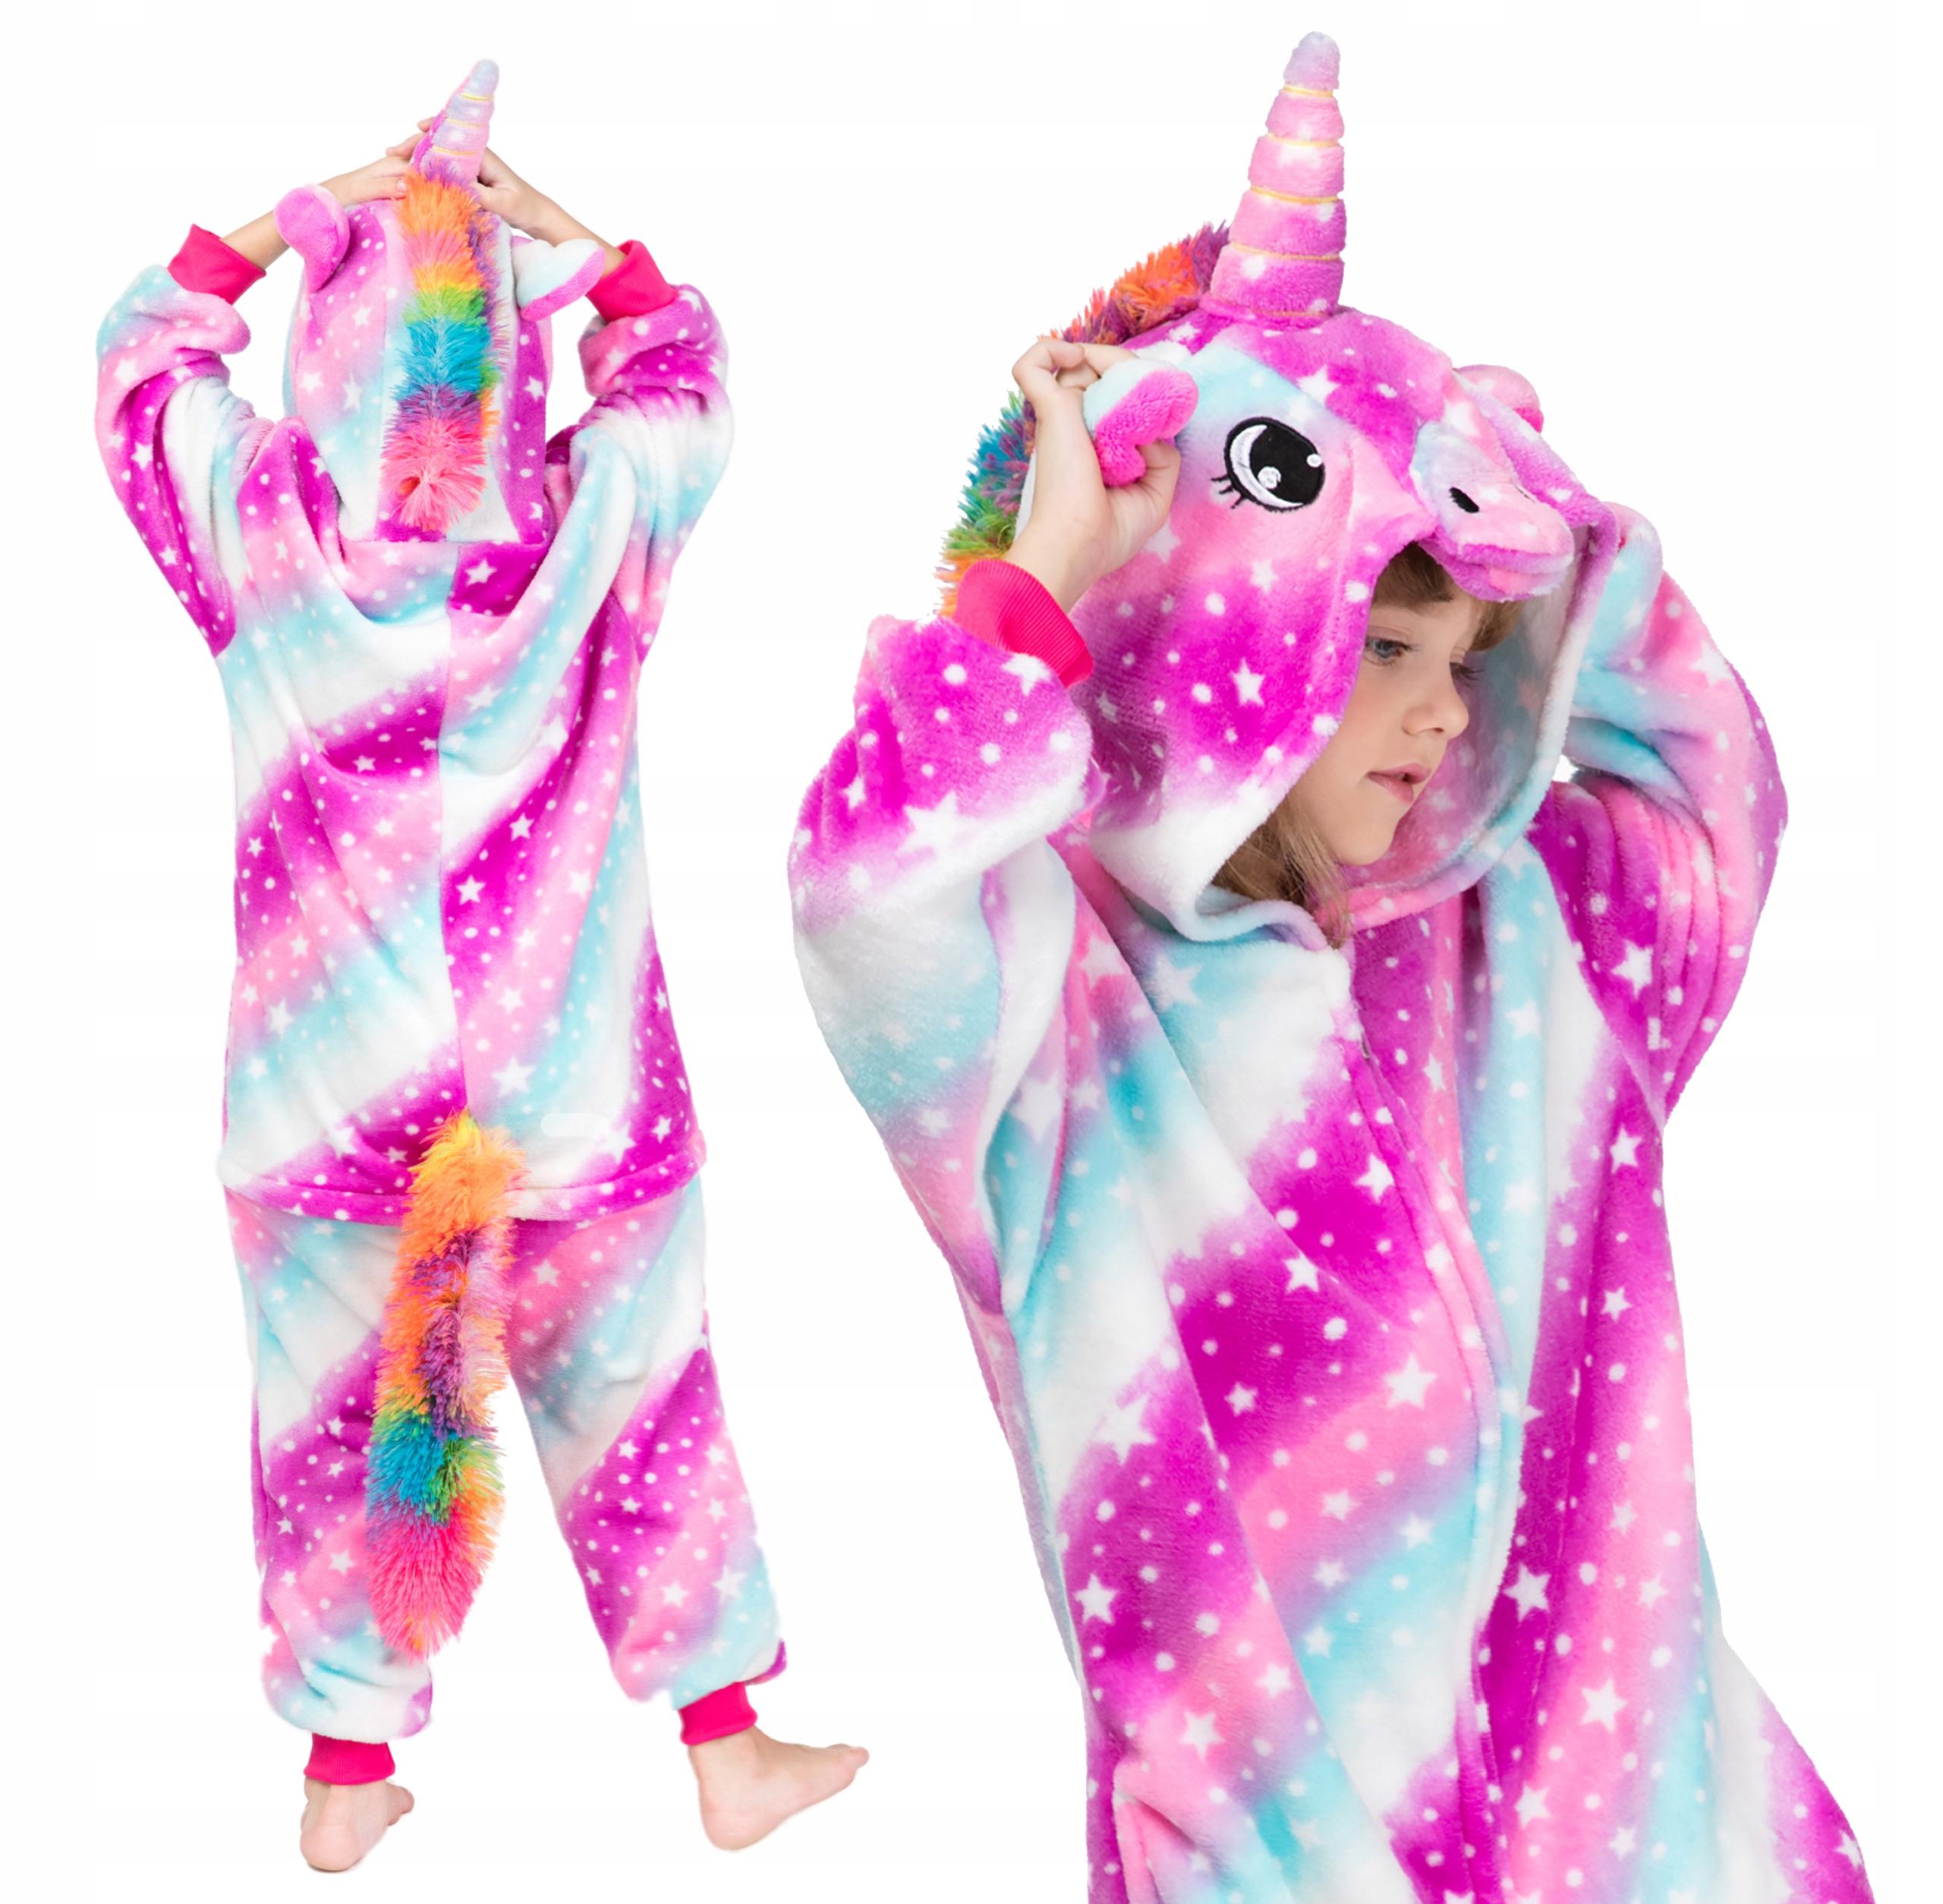 Пижамы кигуруми UNICORN Galaxy для детей 146